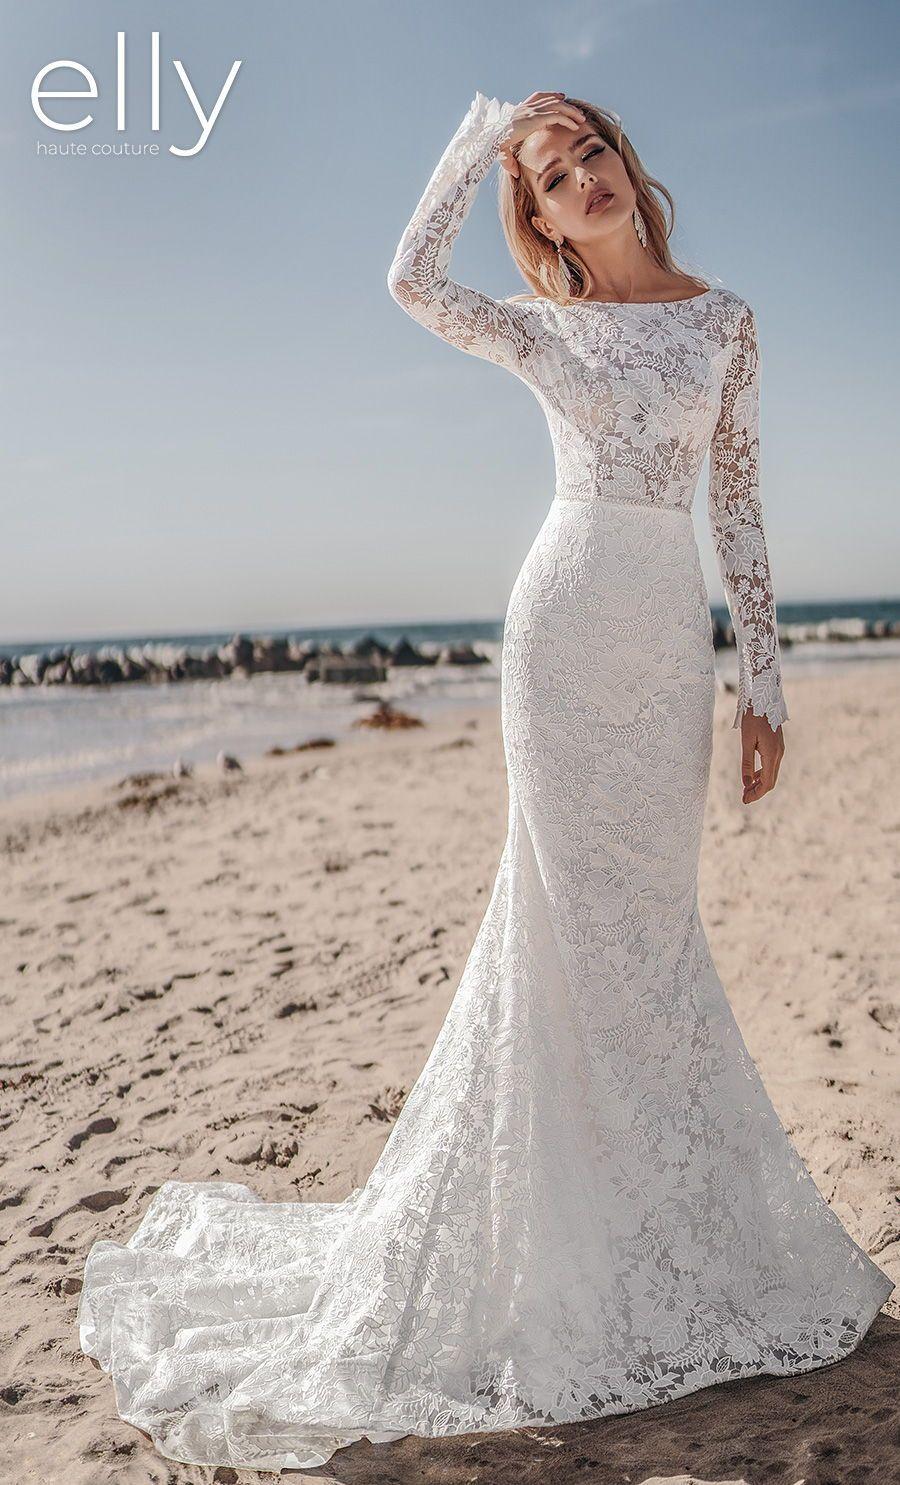 Elly Wedding Dresses Los Angeles Nyc White Mykonos Bridal Collections Wedding Inspirasi In 2020 Wedding Dresses Wedding Dresses Los Angeles Fit And Flare Wedding Dress